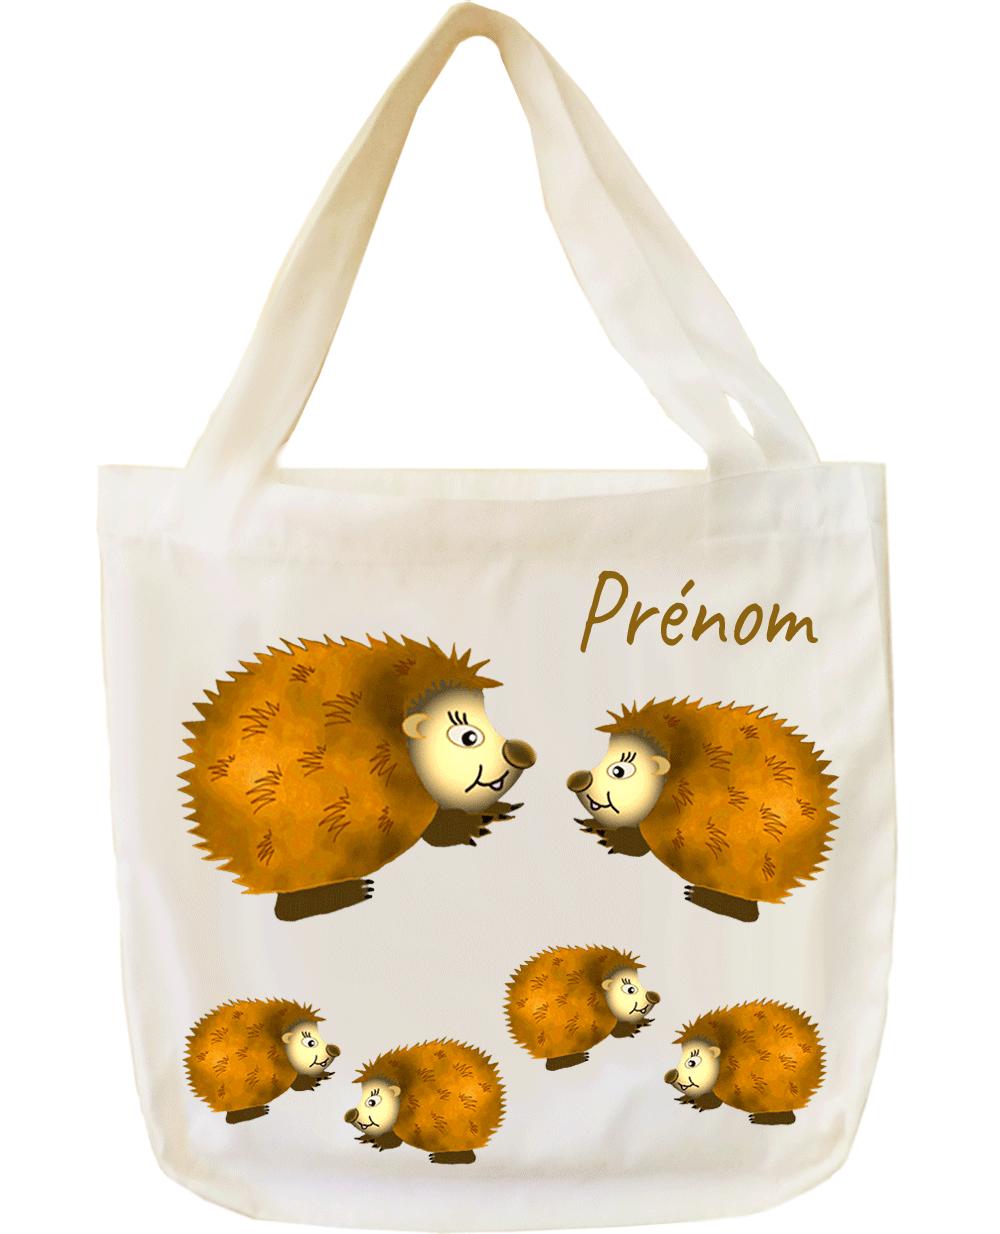 tote-bag;sac;cabas;texti;cadeaux;personnalisable;personnalisation;personnalise;prenom;animal;herisson